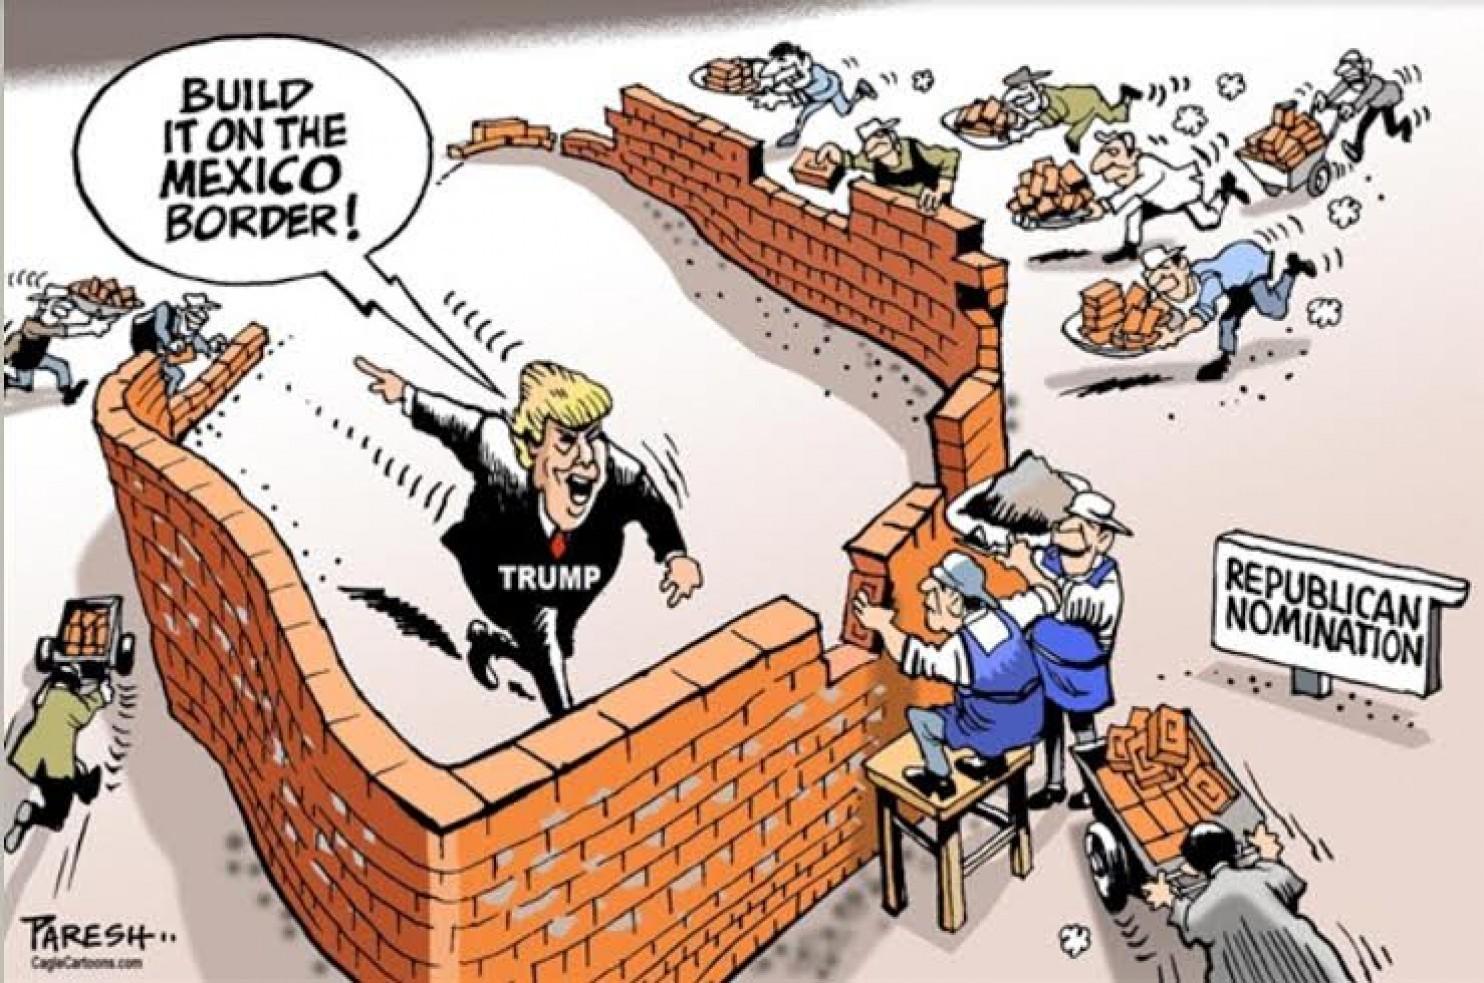 Build A Wall Around Trump